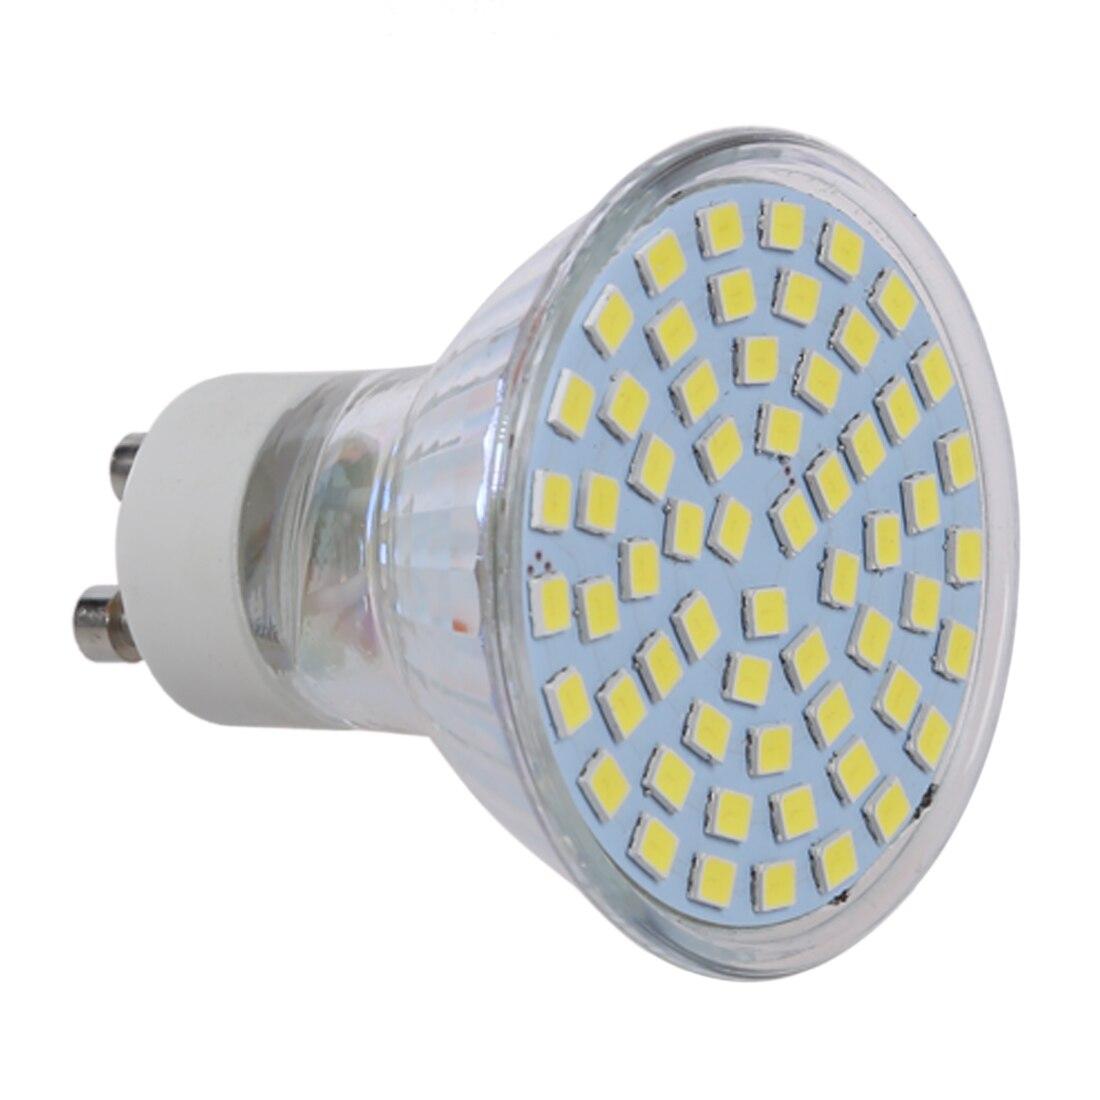 CNIM Hot 10X 5W GU10 3528 SMD 60 LED Pure White 6500K Spot Light Light Bulb Lamp 220V New